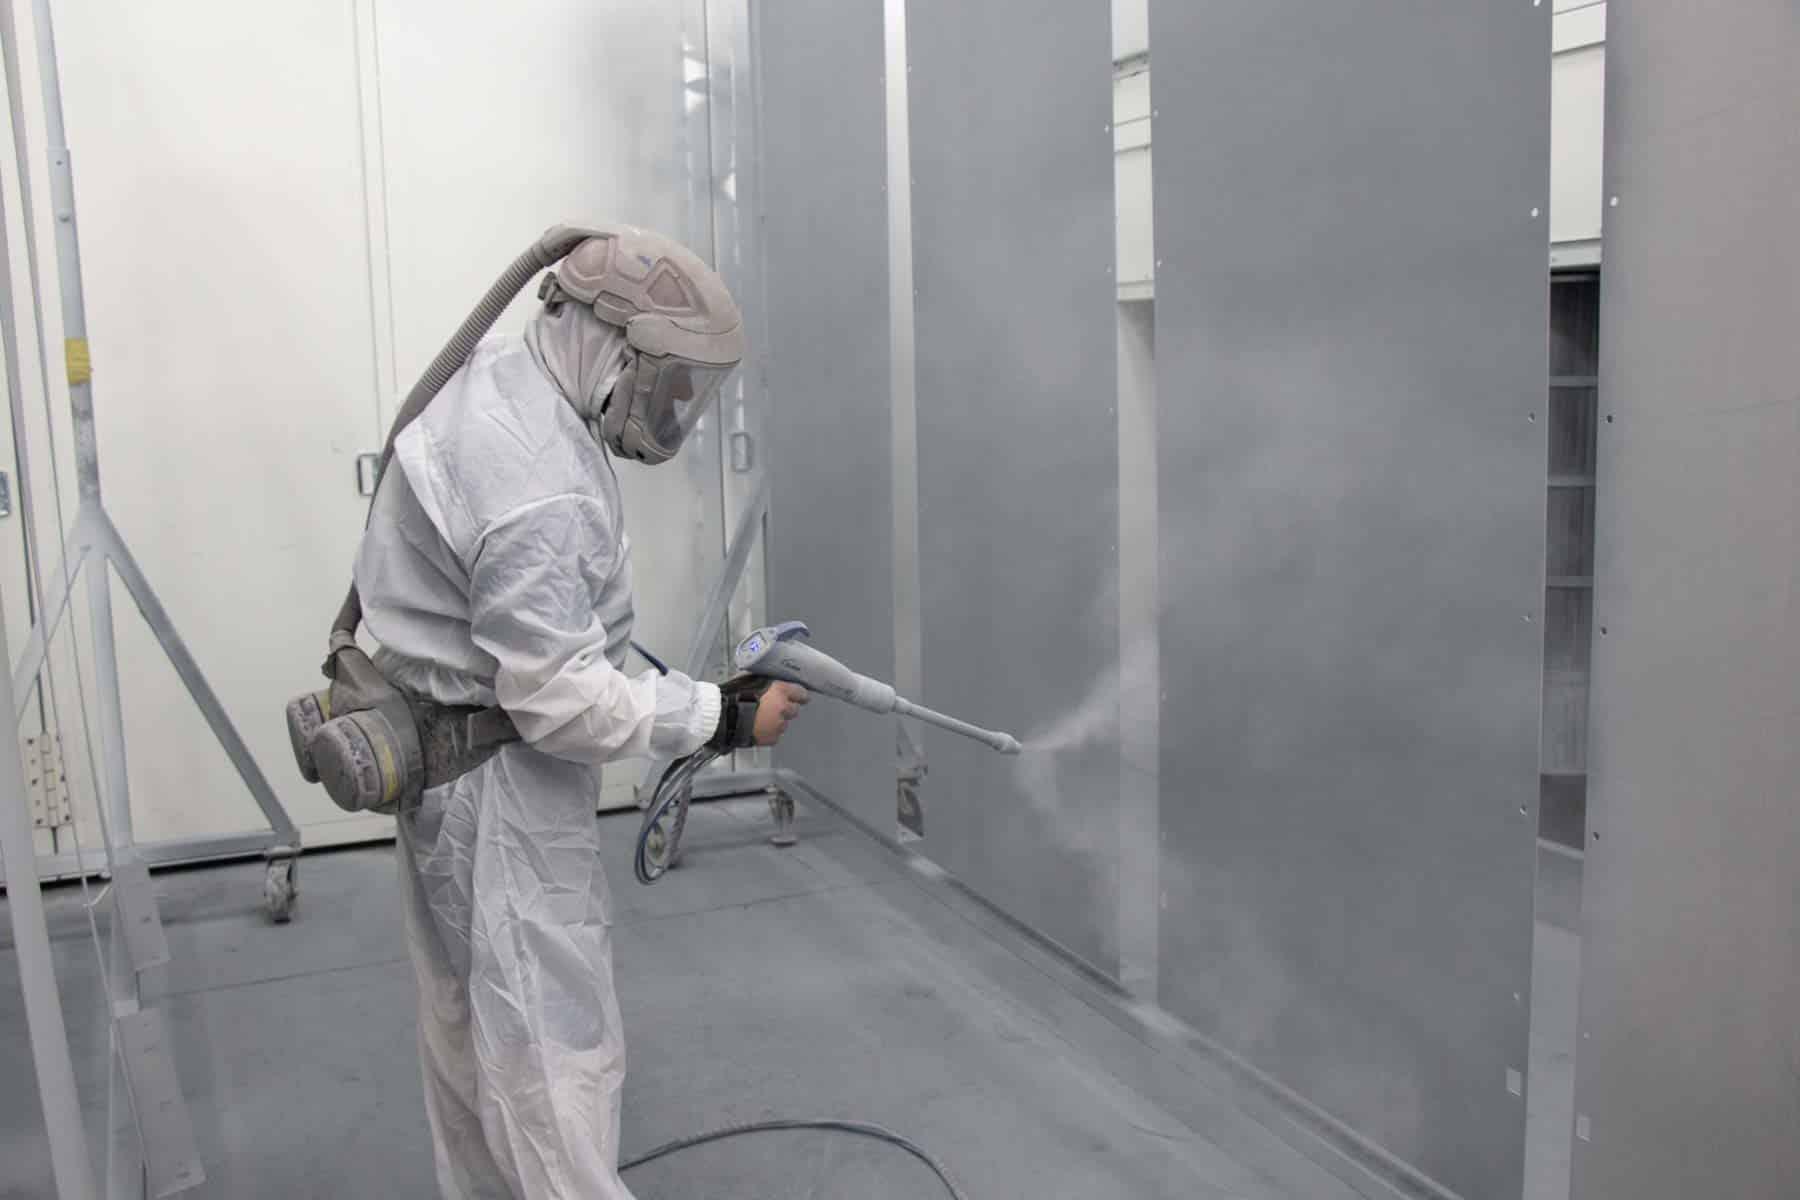 Powder coating metal process extends lifespan of metal enclosures